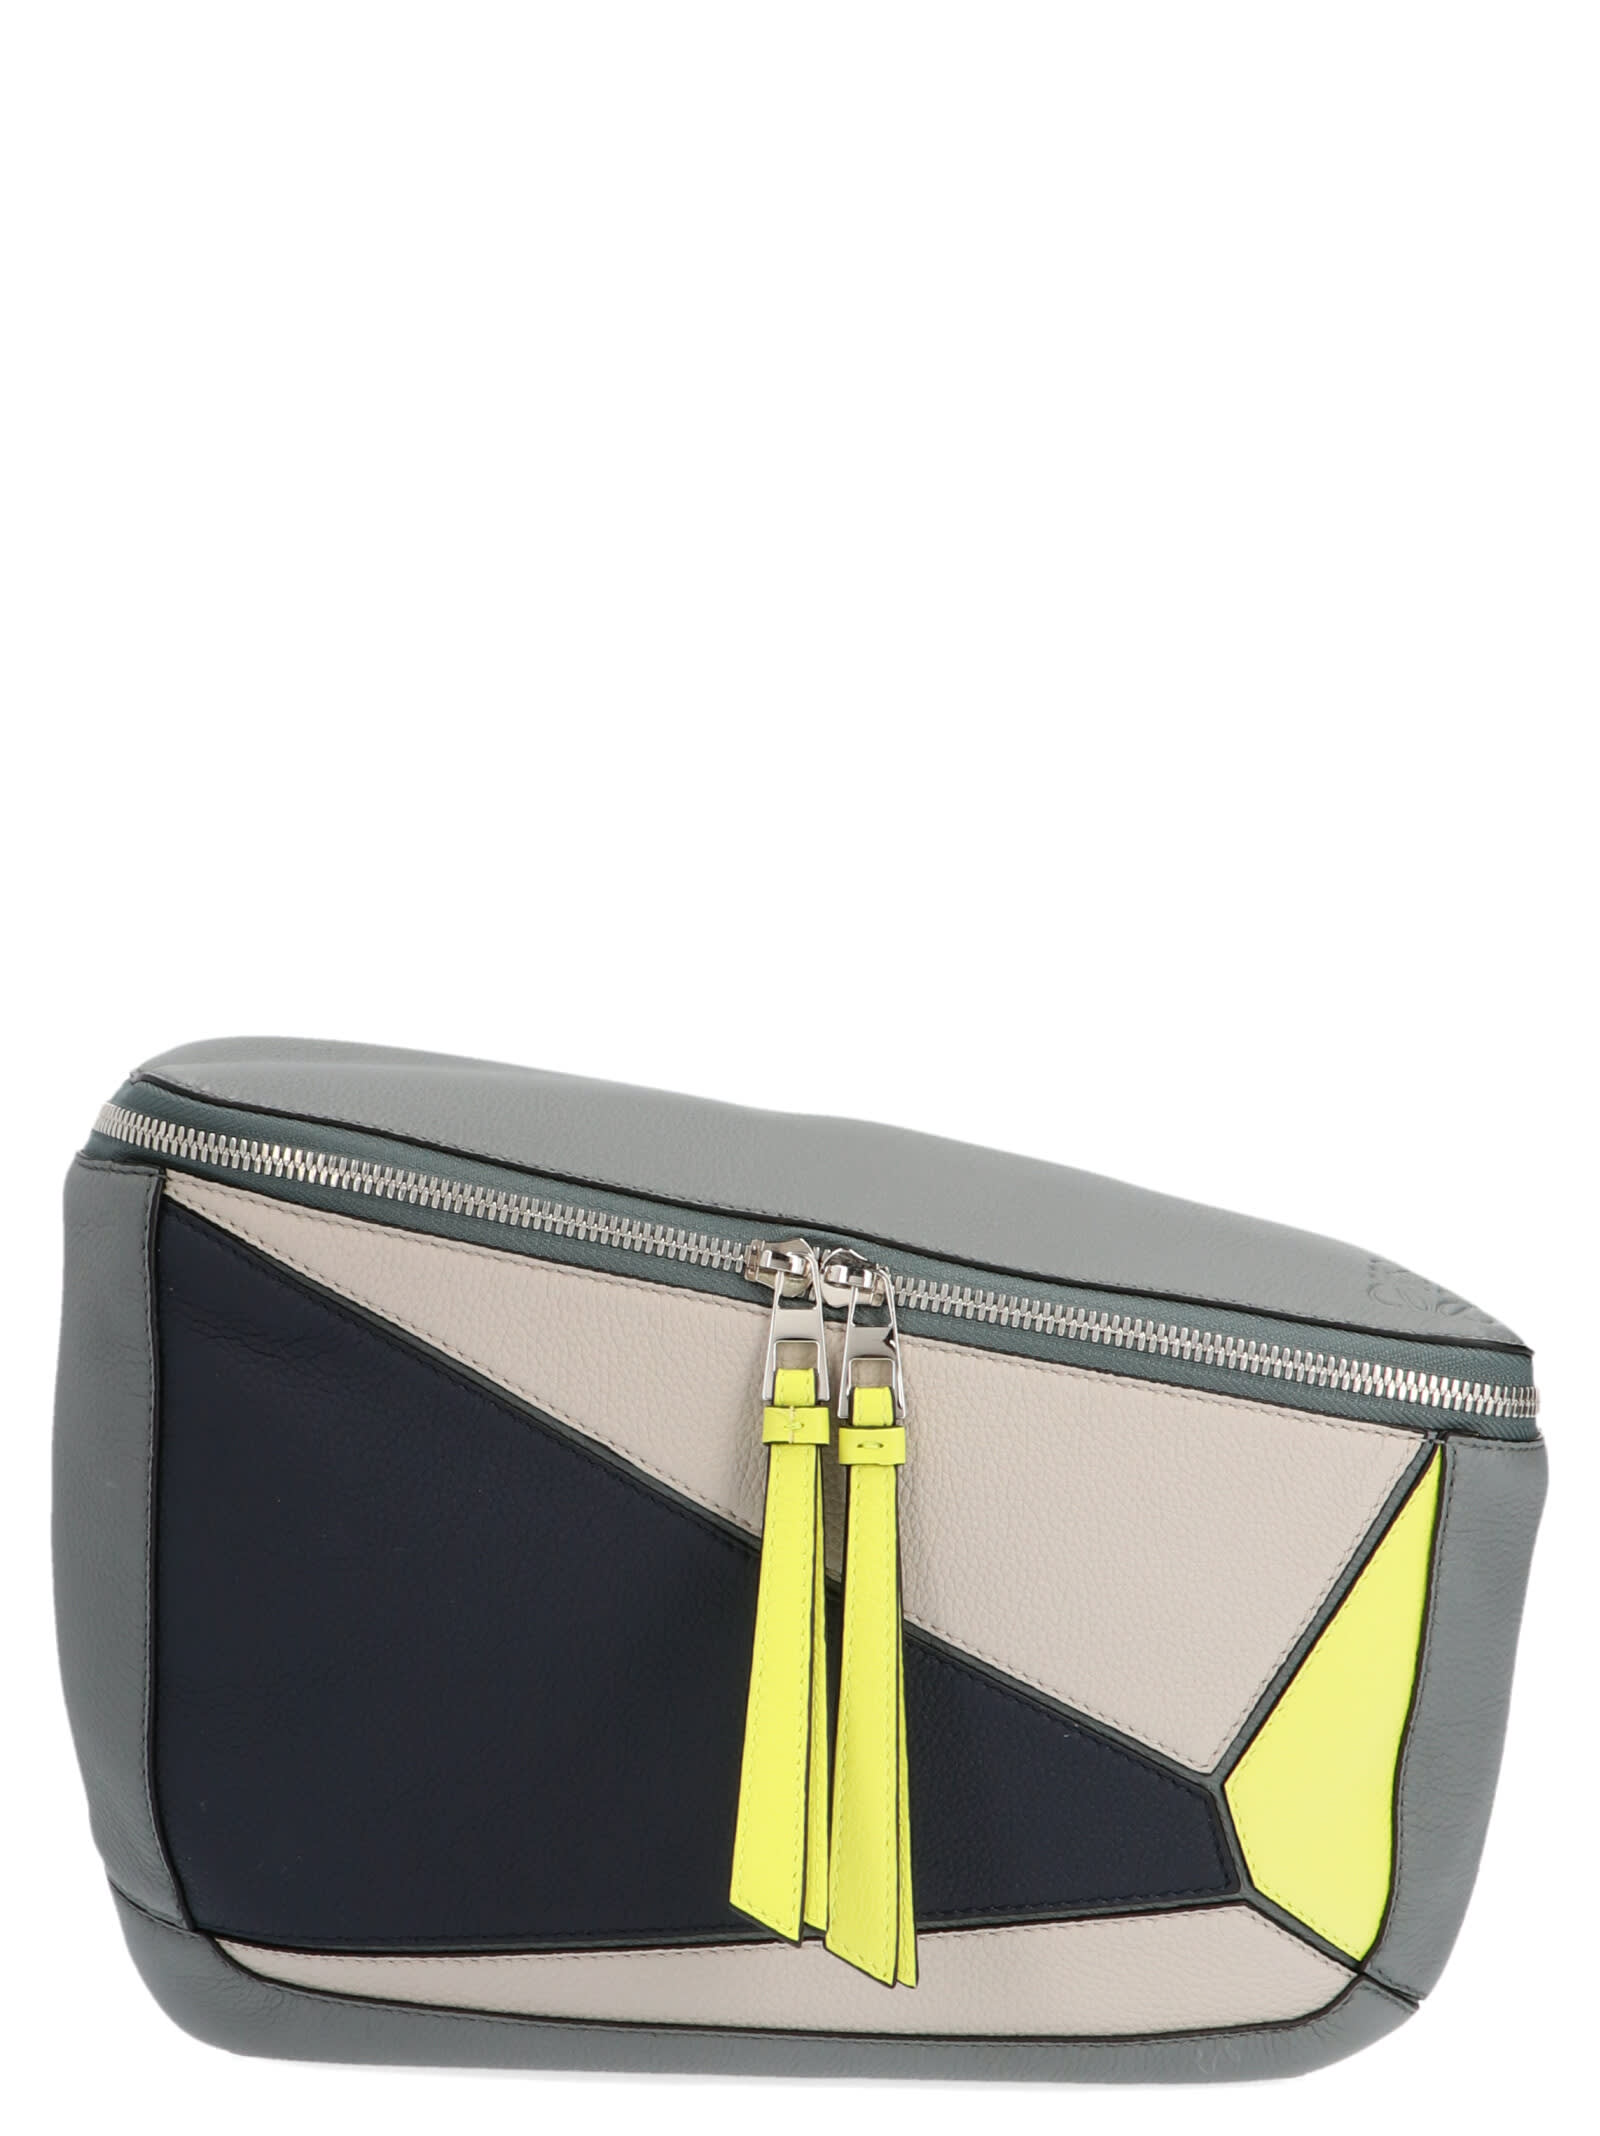 7d28e424232 Loewe 'puzzle Sling' Bag